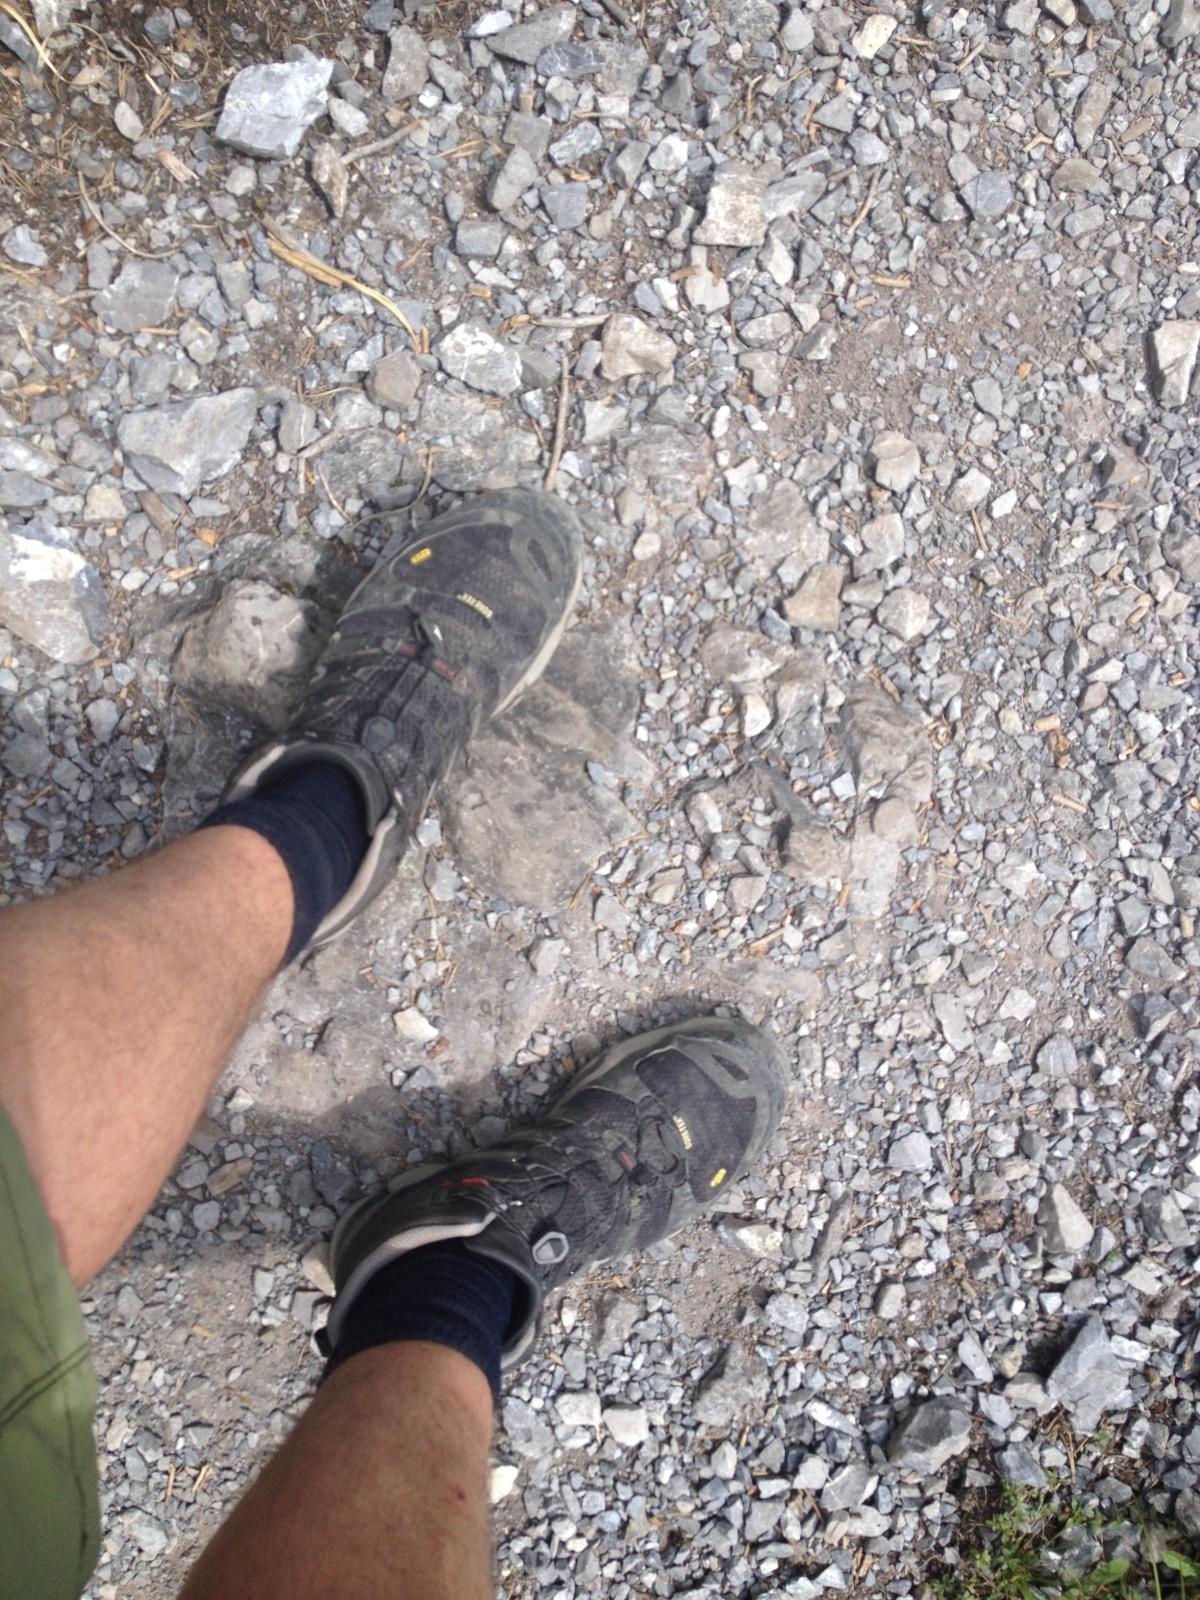 Geschundene Schuhe & Füsse beim Abstieg